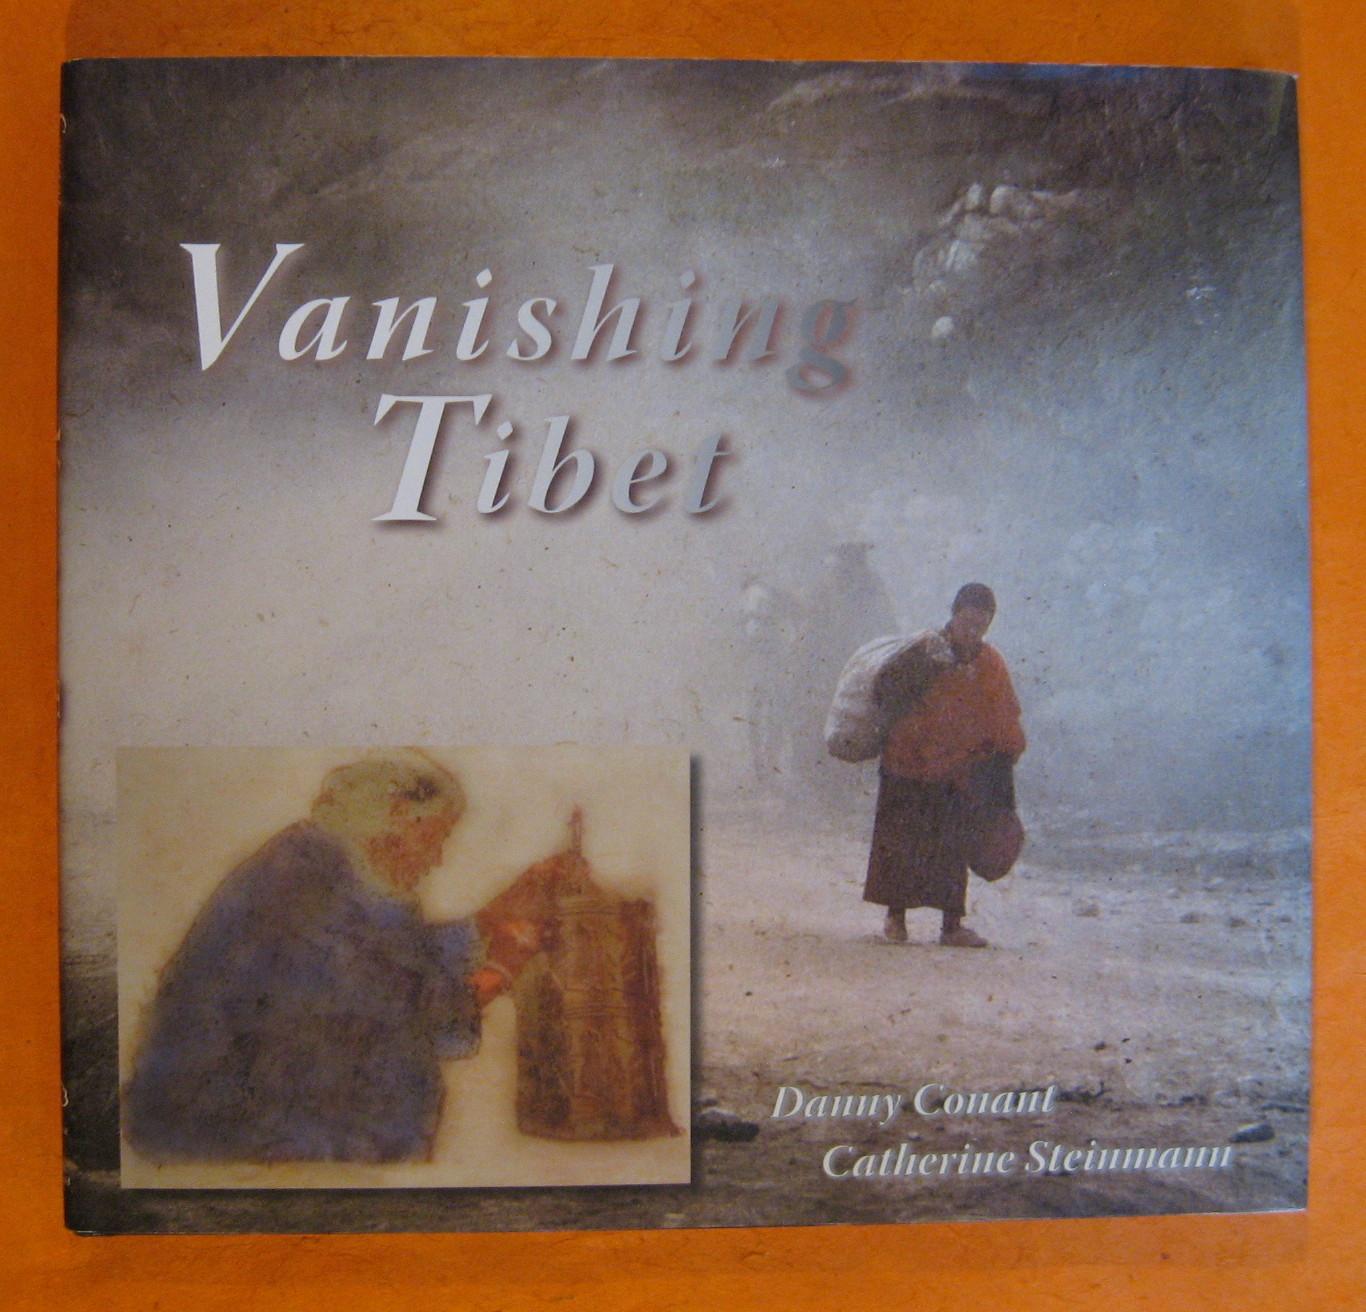 Vanishing Tibet, Danny Conant, Catherine Steinmann, Robert A.F. Thurman (Foreword), Thomas F. Yarnall (Designer)